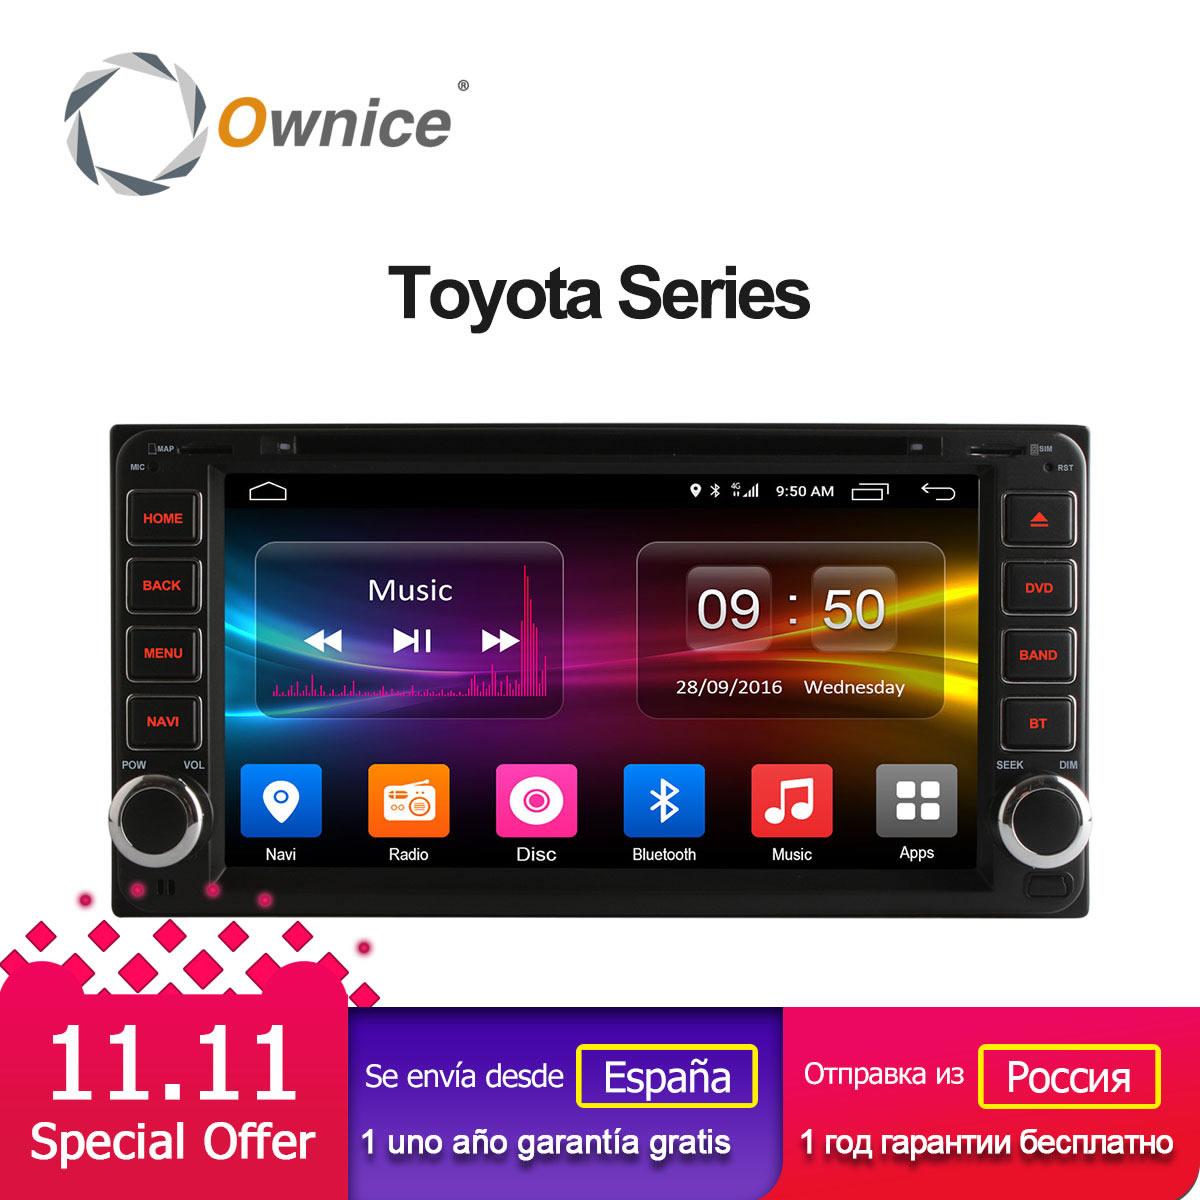 цена на Ownice Android 6.0 Octa 8 Core 2G RAM car dvd player for Toyota Hilux VIOS Old Camry Prado RAV4 Prado 2003-2008 4G LTE Network